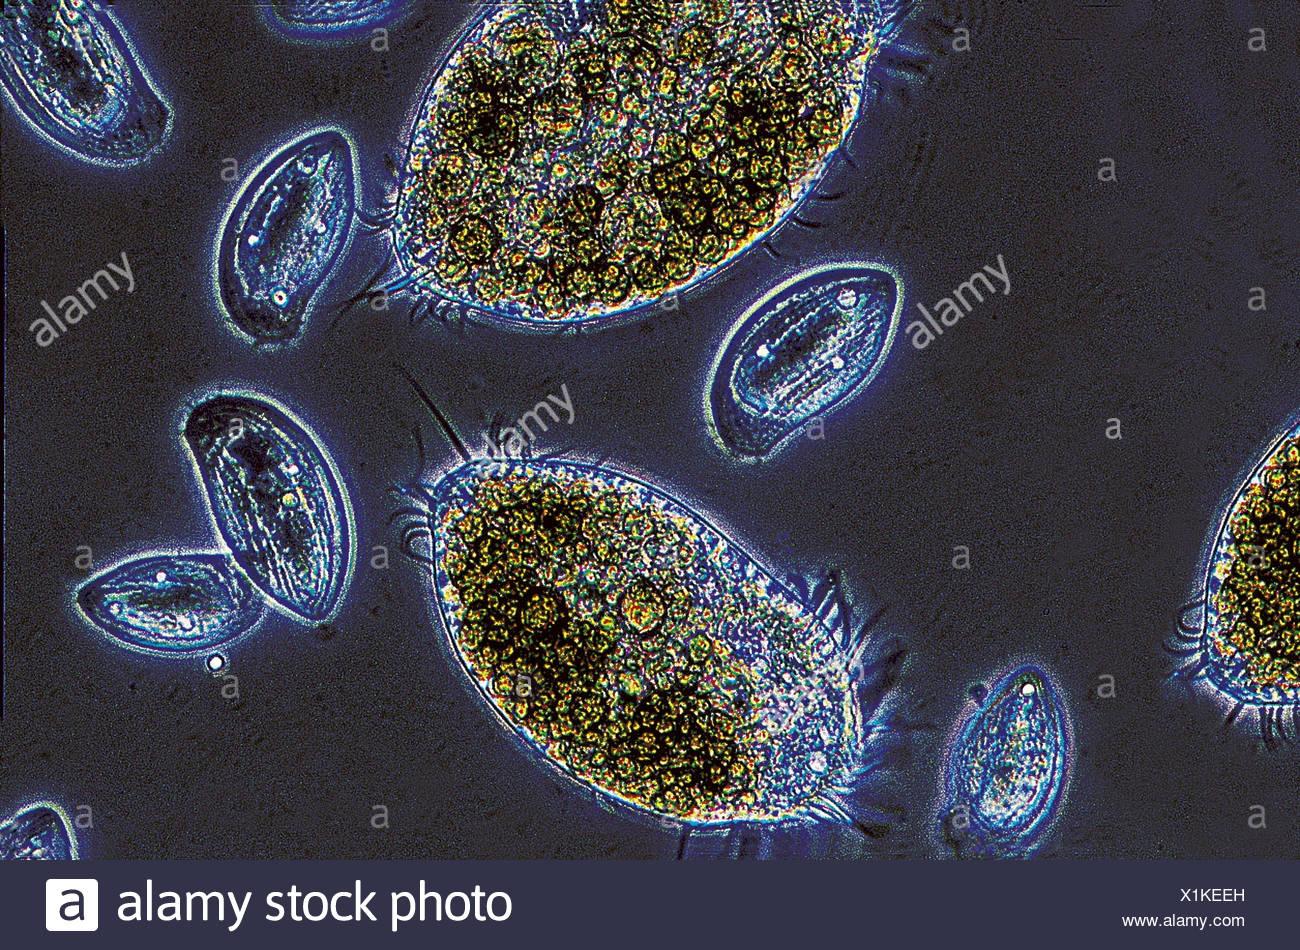 Mikroskop aufnahme borste kleines tier oxytricha goldhahnenfuß